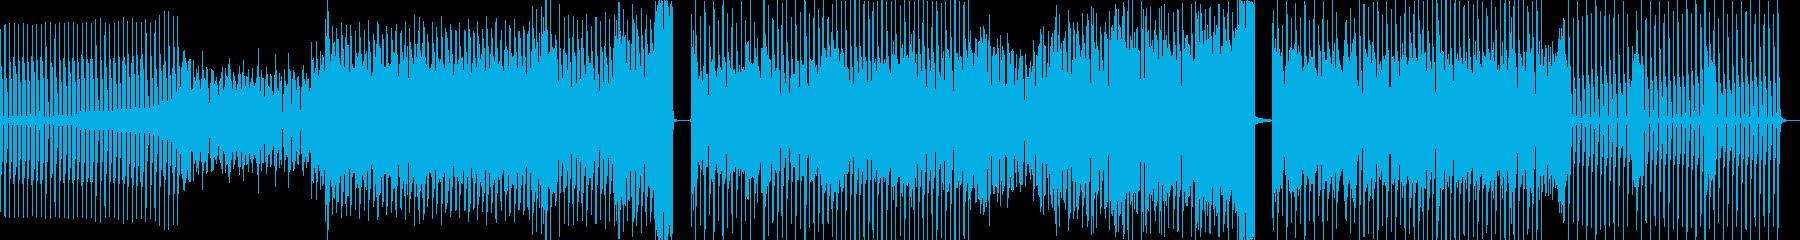 80s感あるクールなEDMの再生済みの波形